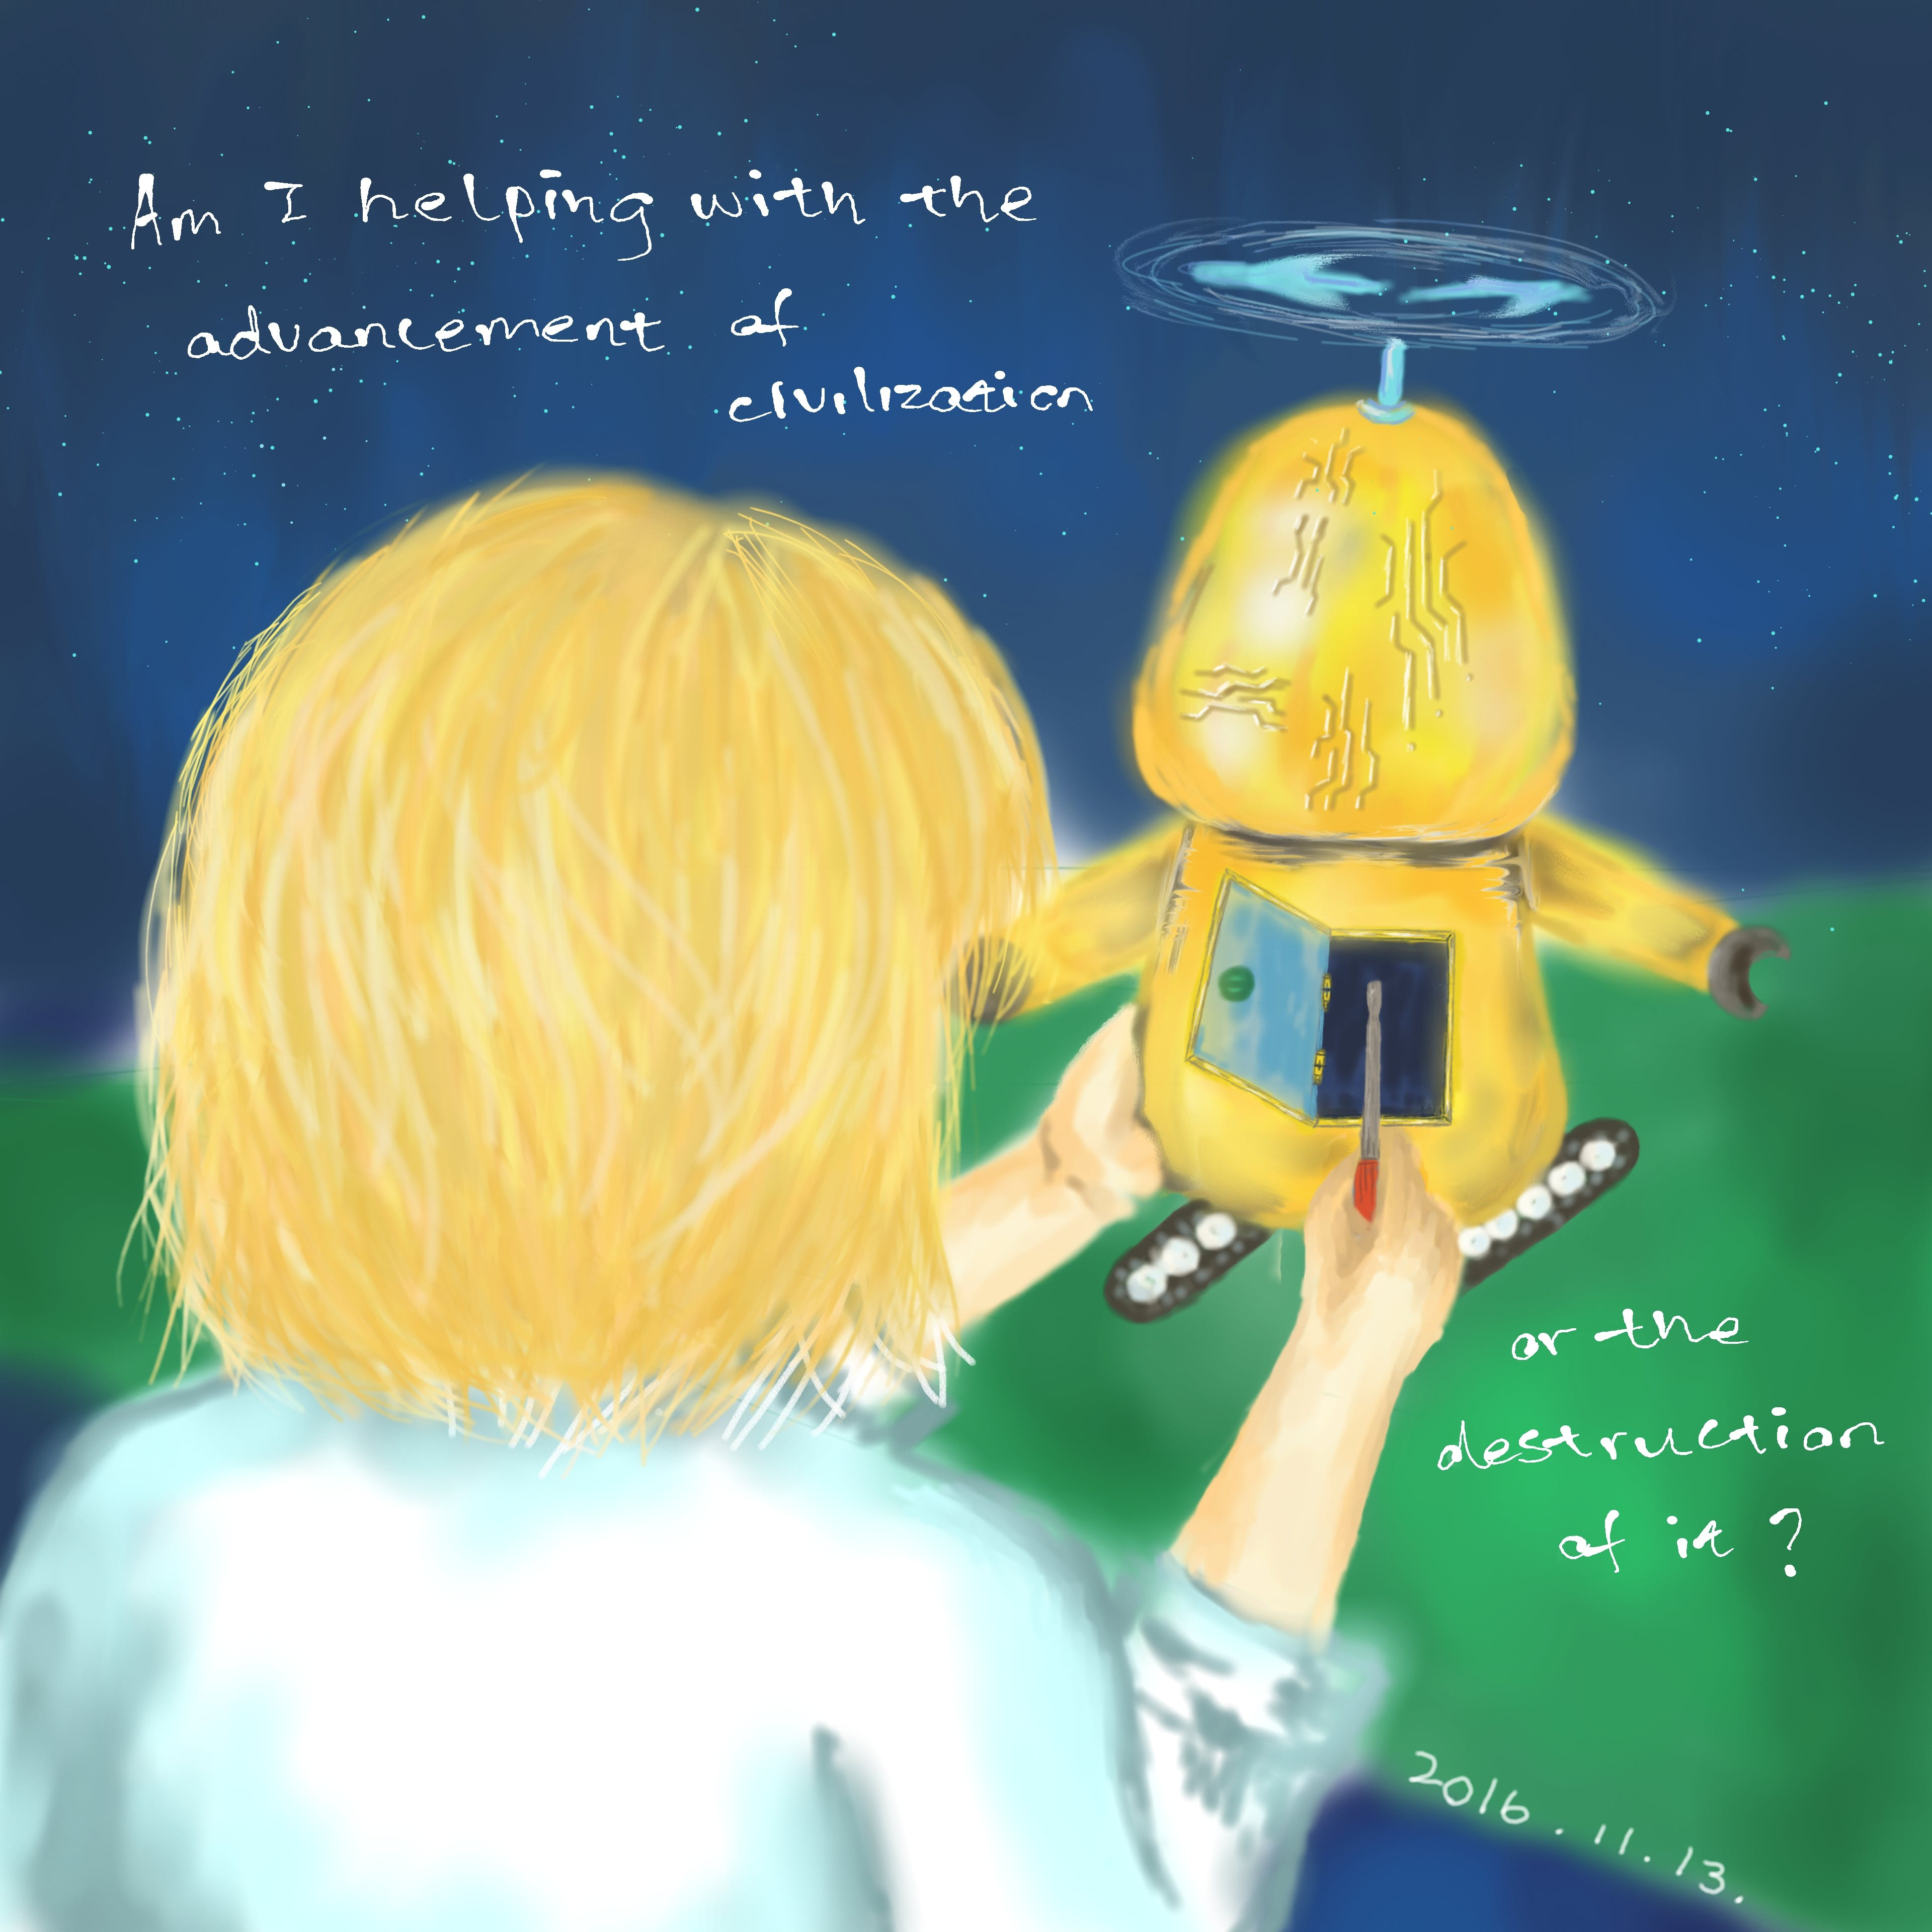 www.artbyphysicistkittyyeung.com